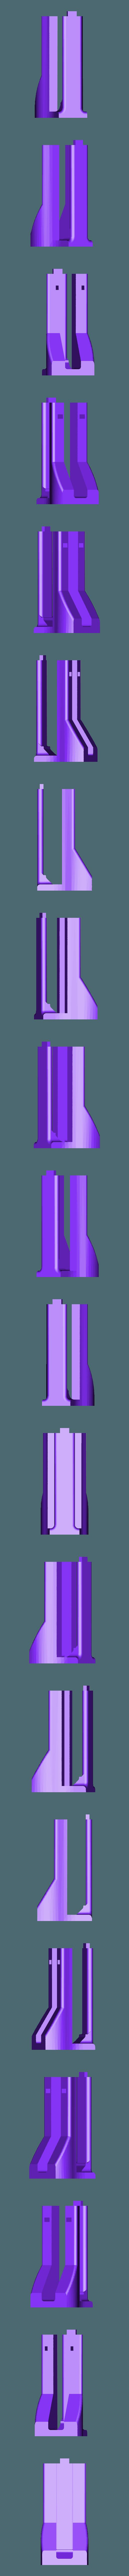 1902-02_Part01_3.STL Download free STL file Satnav holder • 3D printer template, EL3D